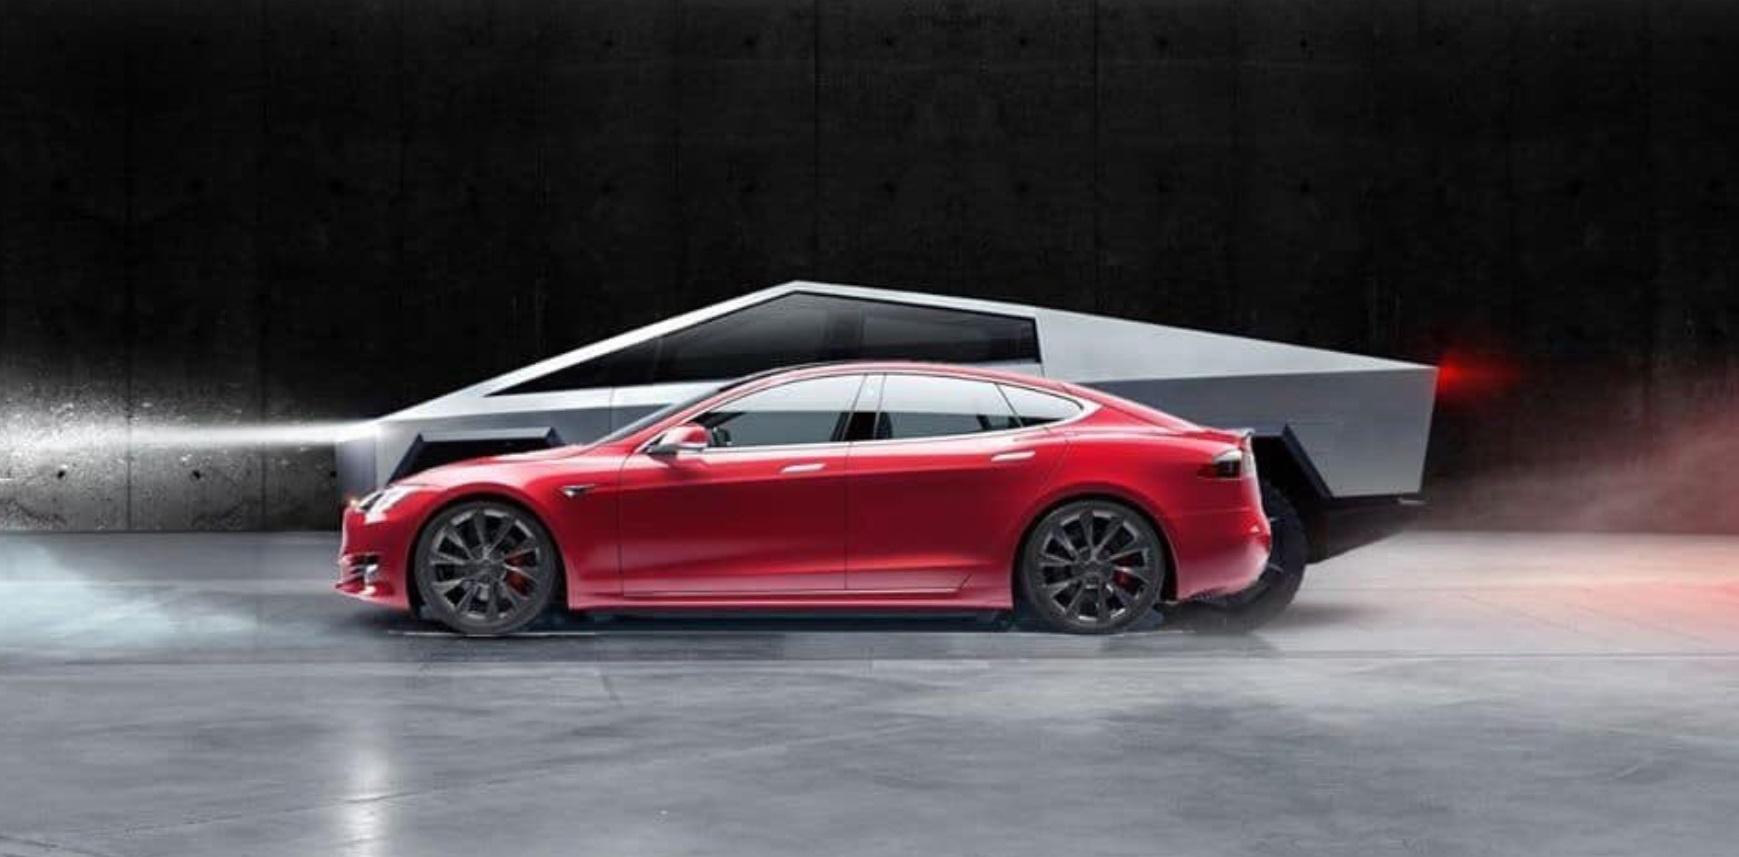 Tesla Cybertruck - Page 3 PHOTOS-Tesla-CyberTruck-Size-comparison-Vs-Model-S